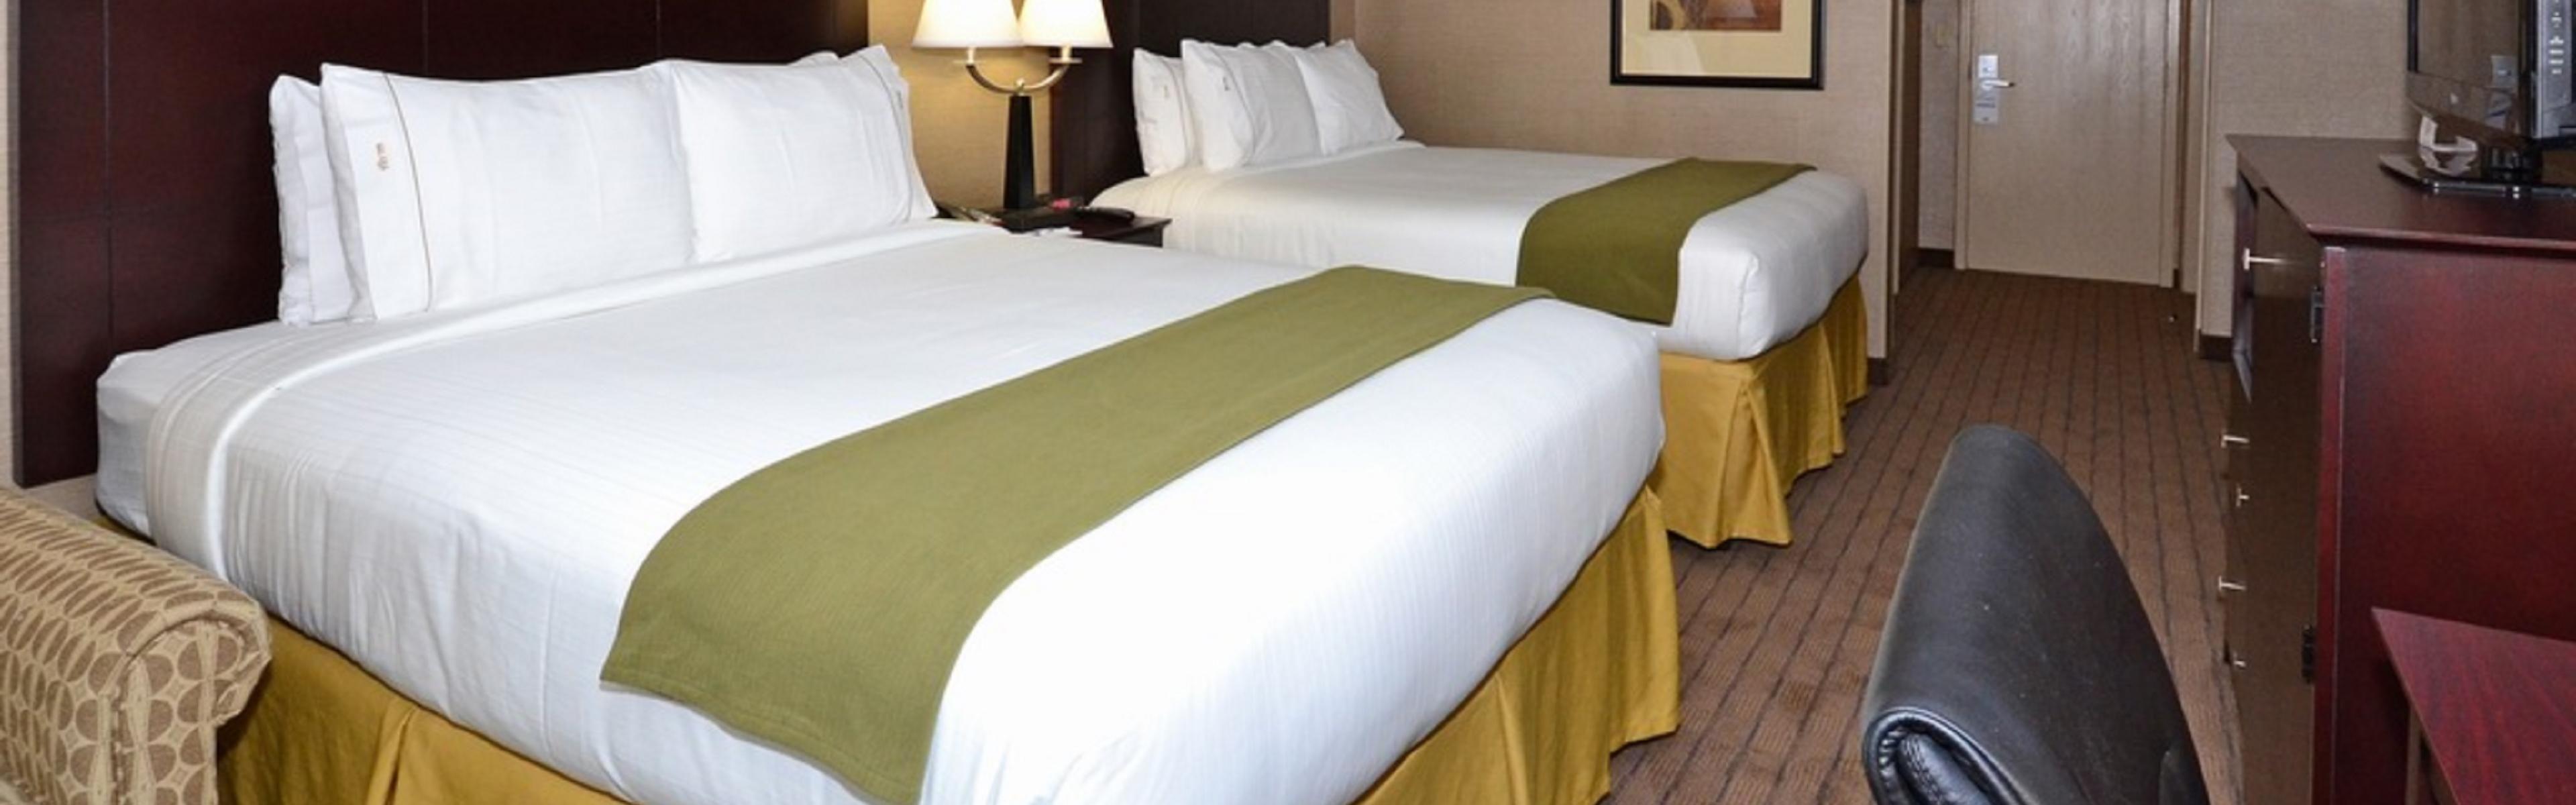 Holiday Inn Express Brockton - Boston image 1